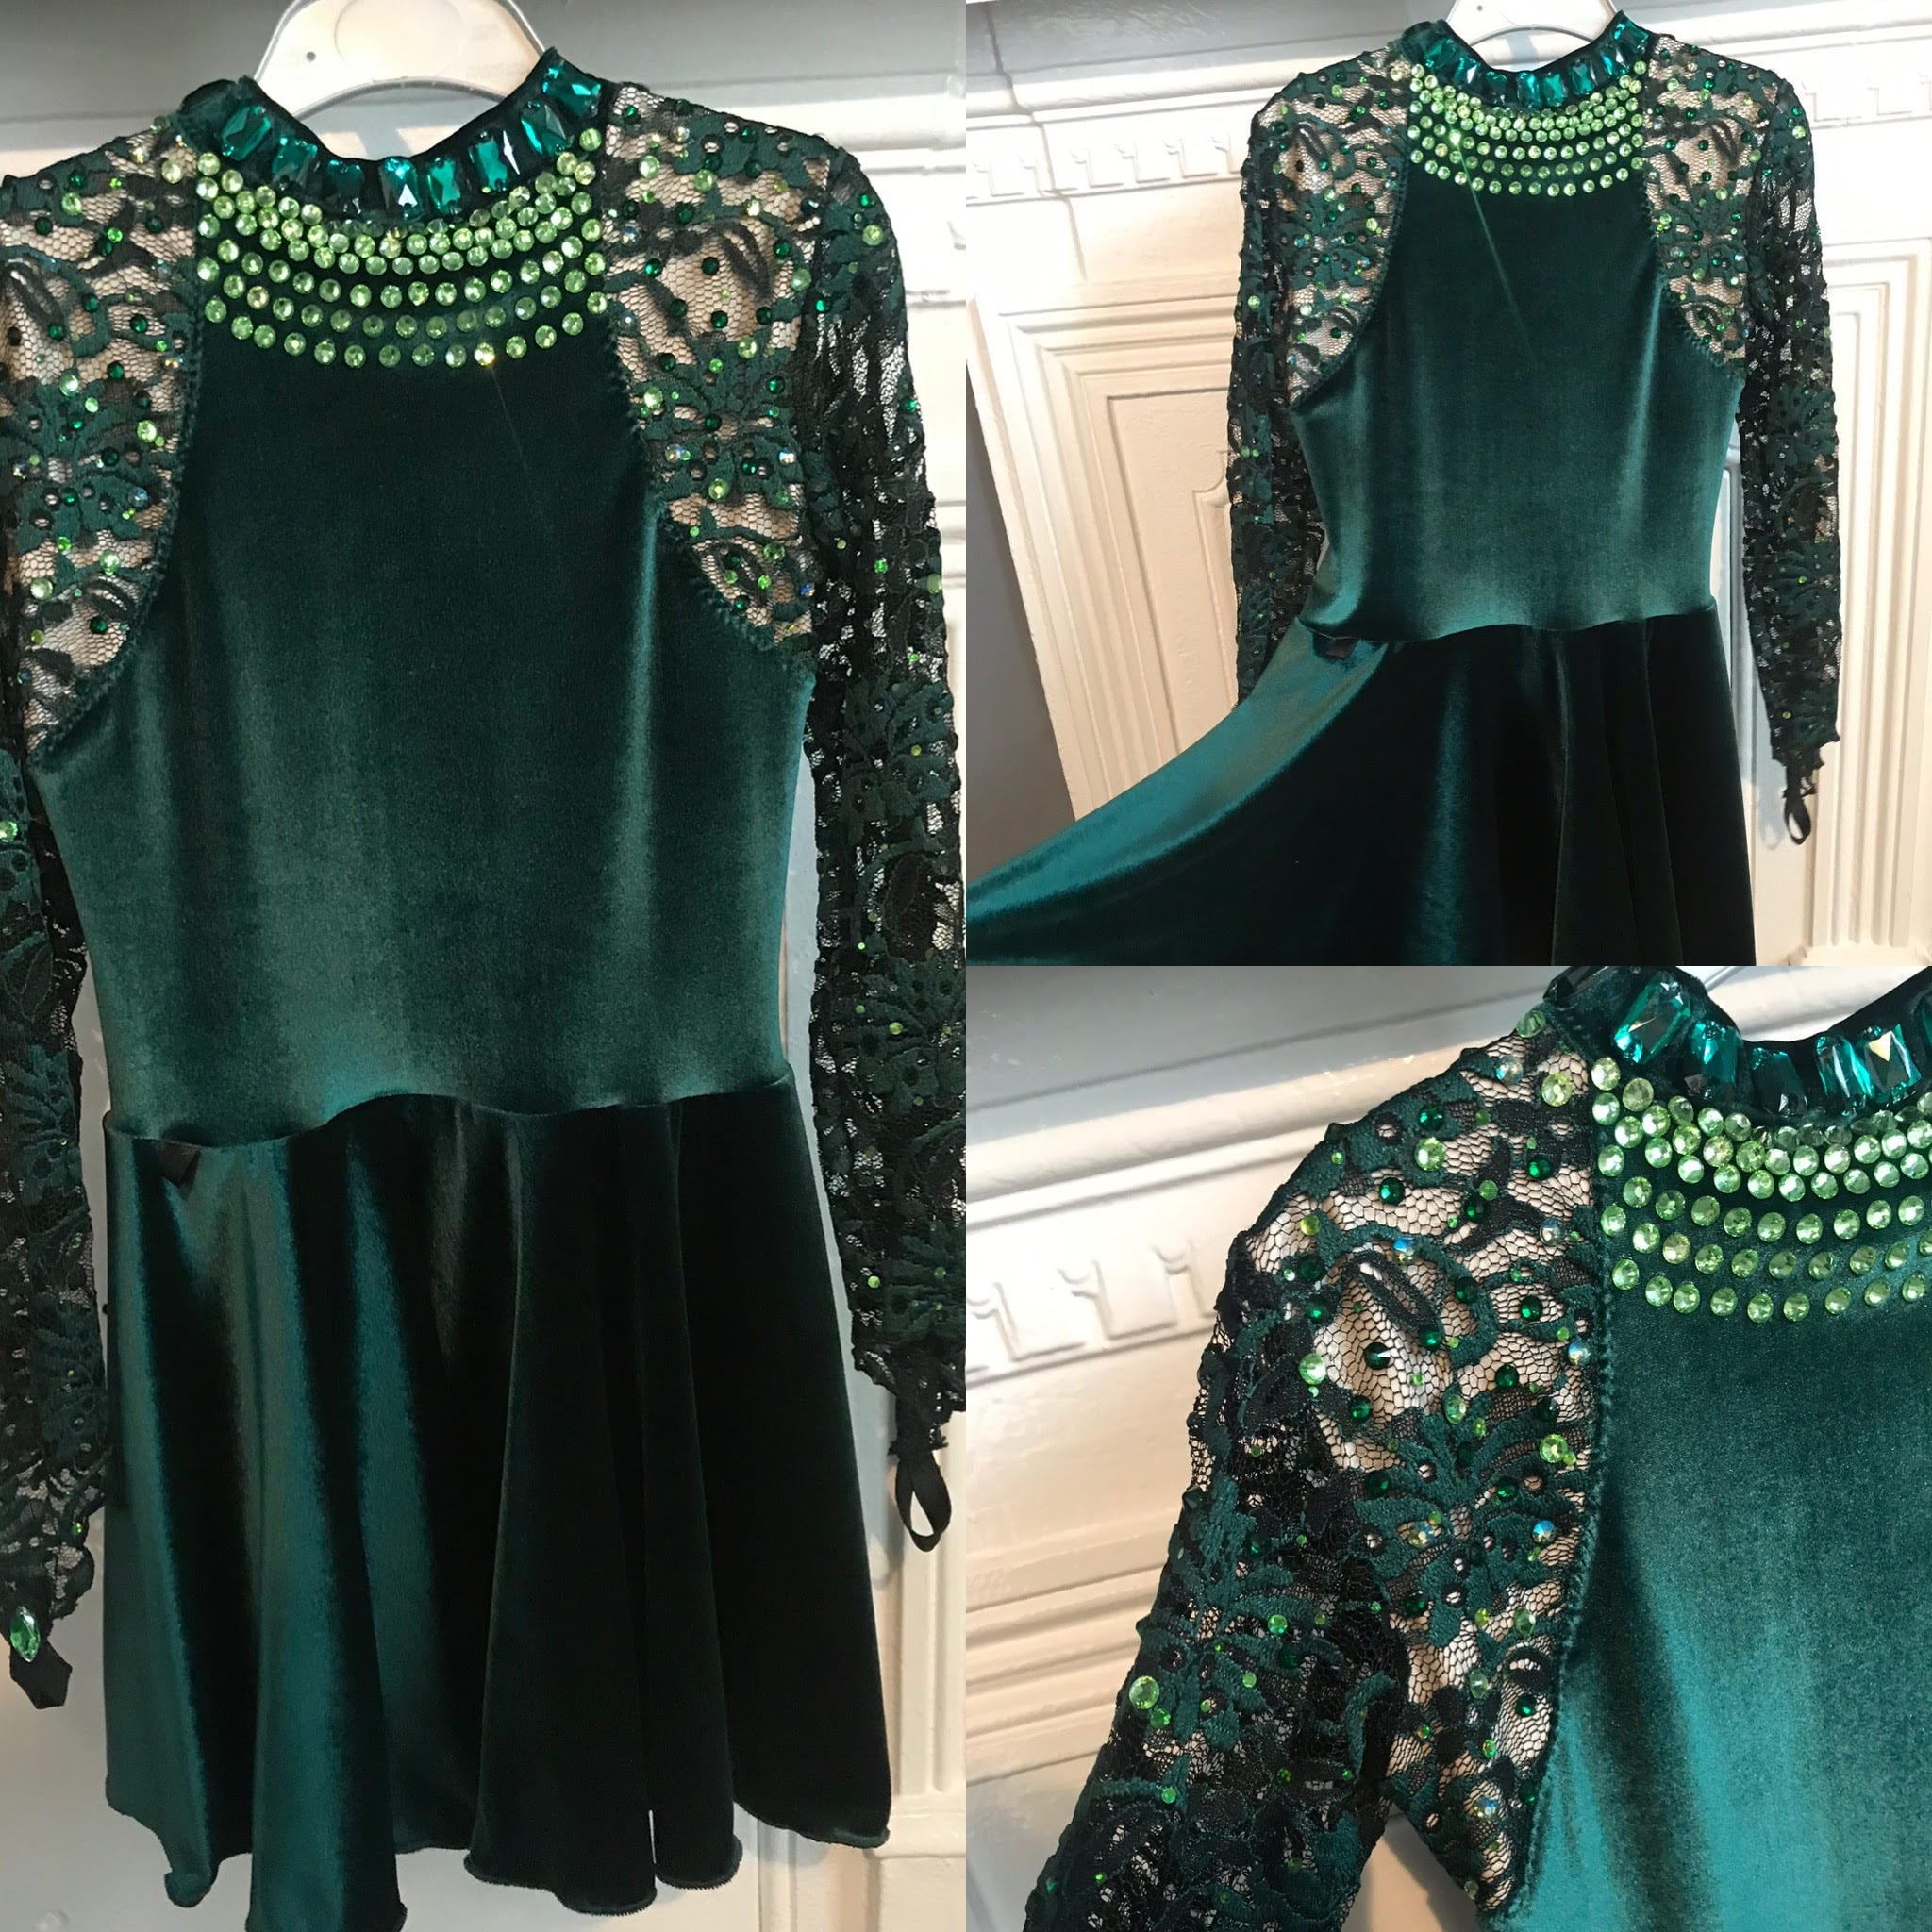 Ember Designs Dark Green In-between Dress